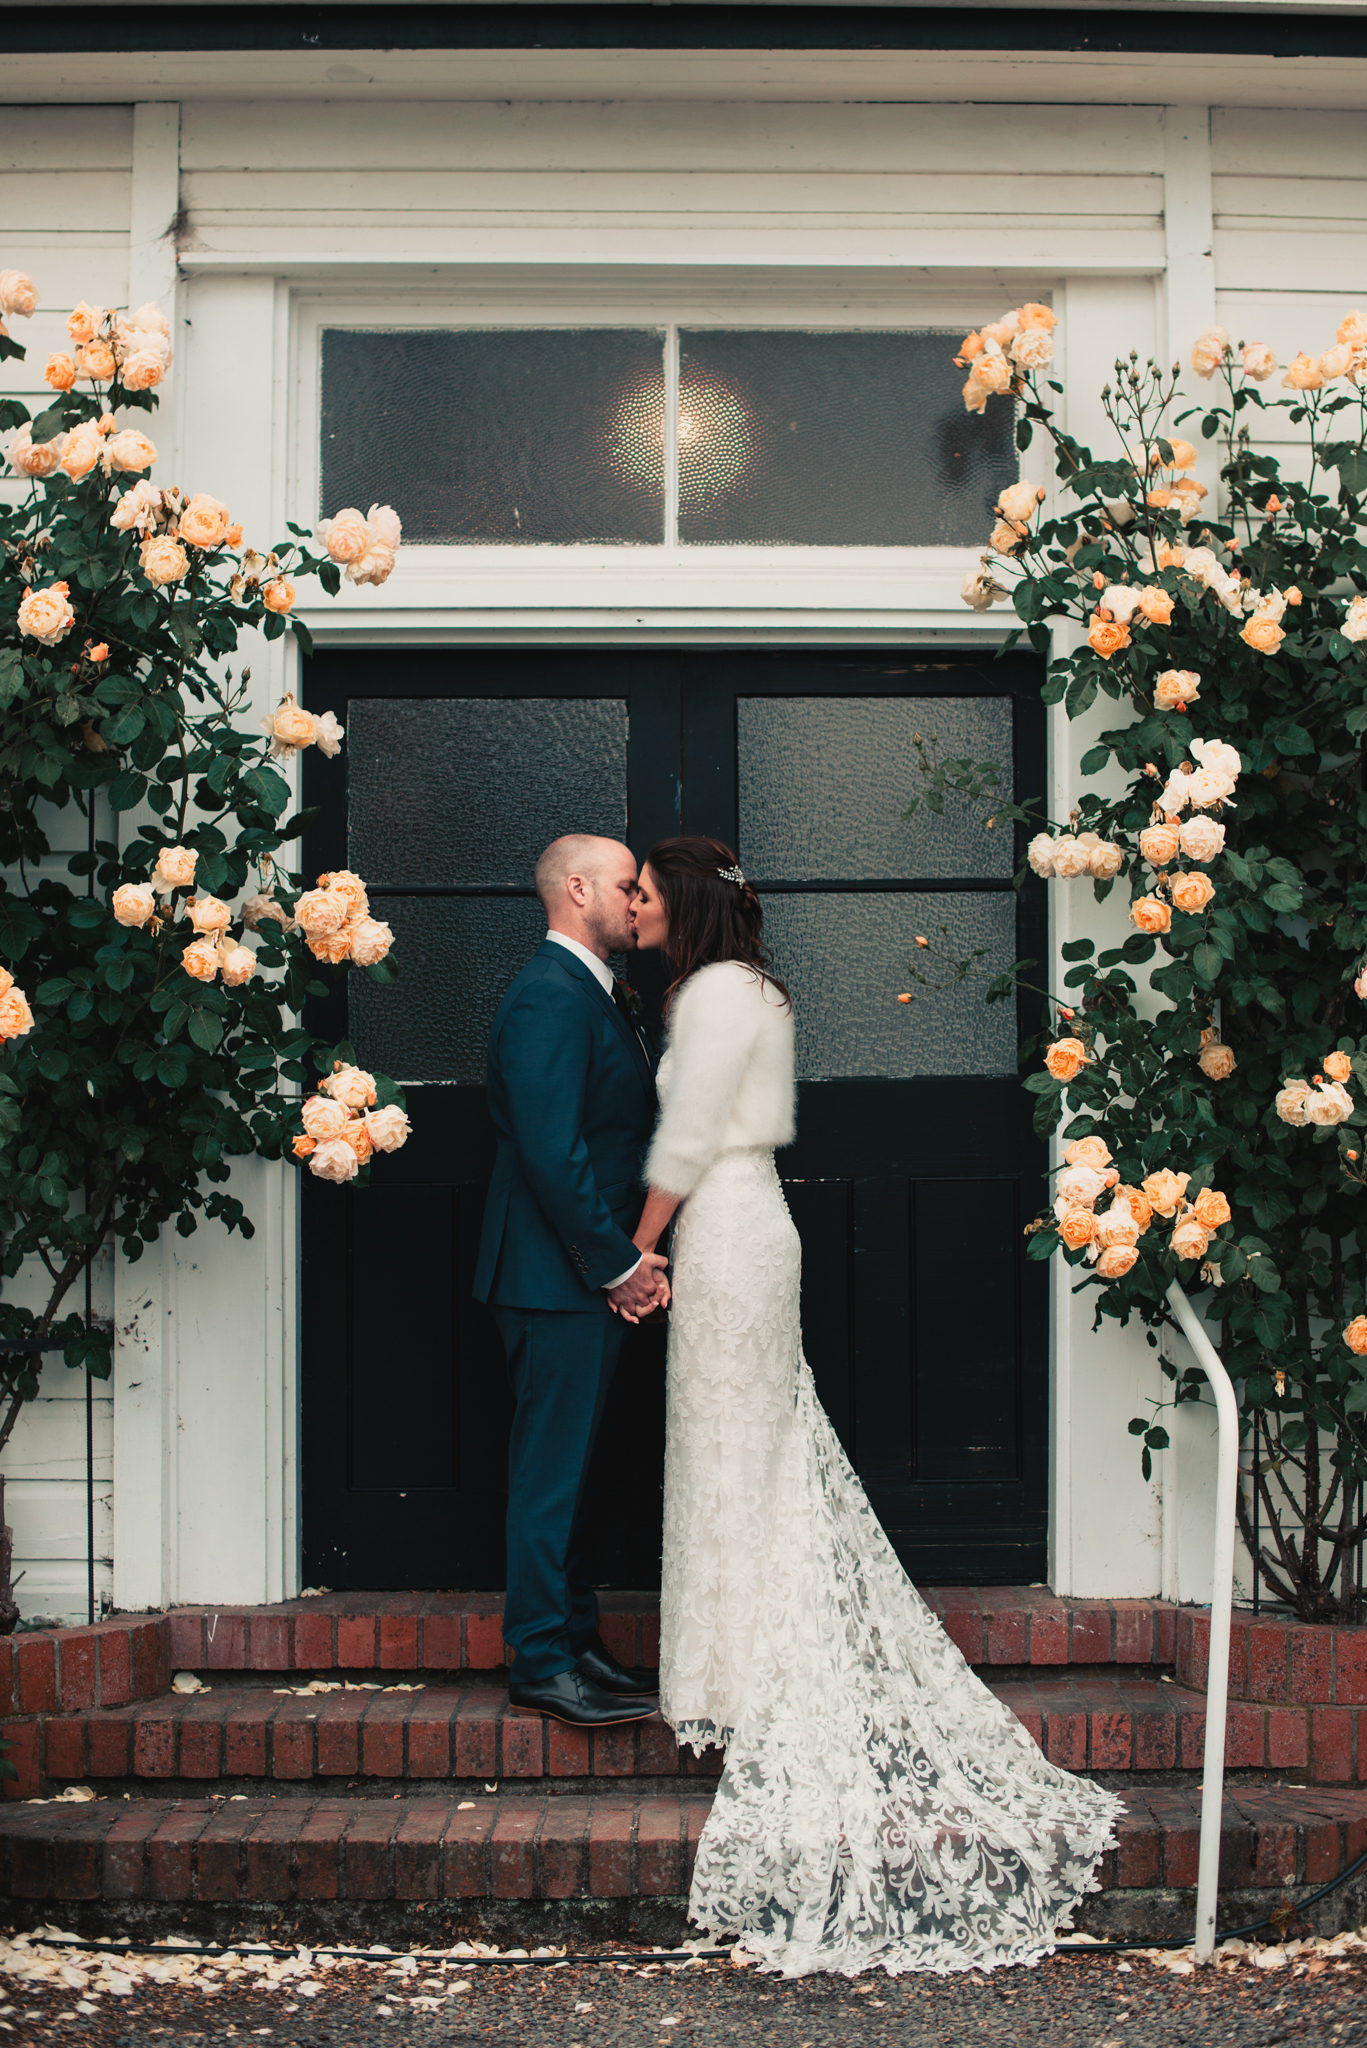 LOVELENSCAPES PHOTOGRAPHY • VISUAL POETRY • NEW ZEALAND WEDDING PHOTOGRAPHER • AUSTRALIAN WEDDING PHOTOGRAPHER • BRISBANE • MELBOURNE • SYDNEY • HOBART • TARUREKA ESTATE • ANNA CAMPBELL • 155.jpg